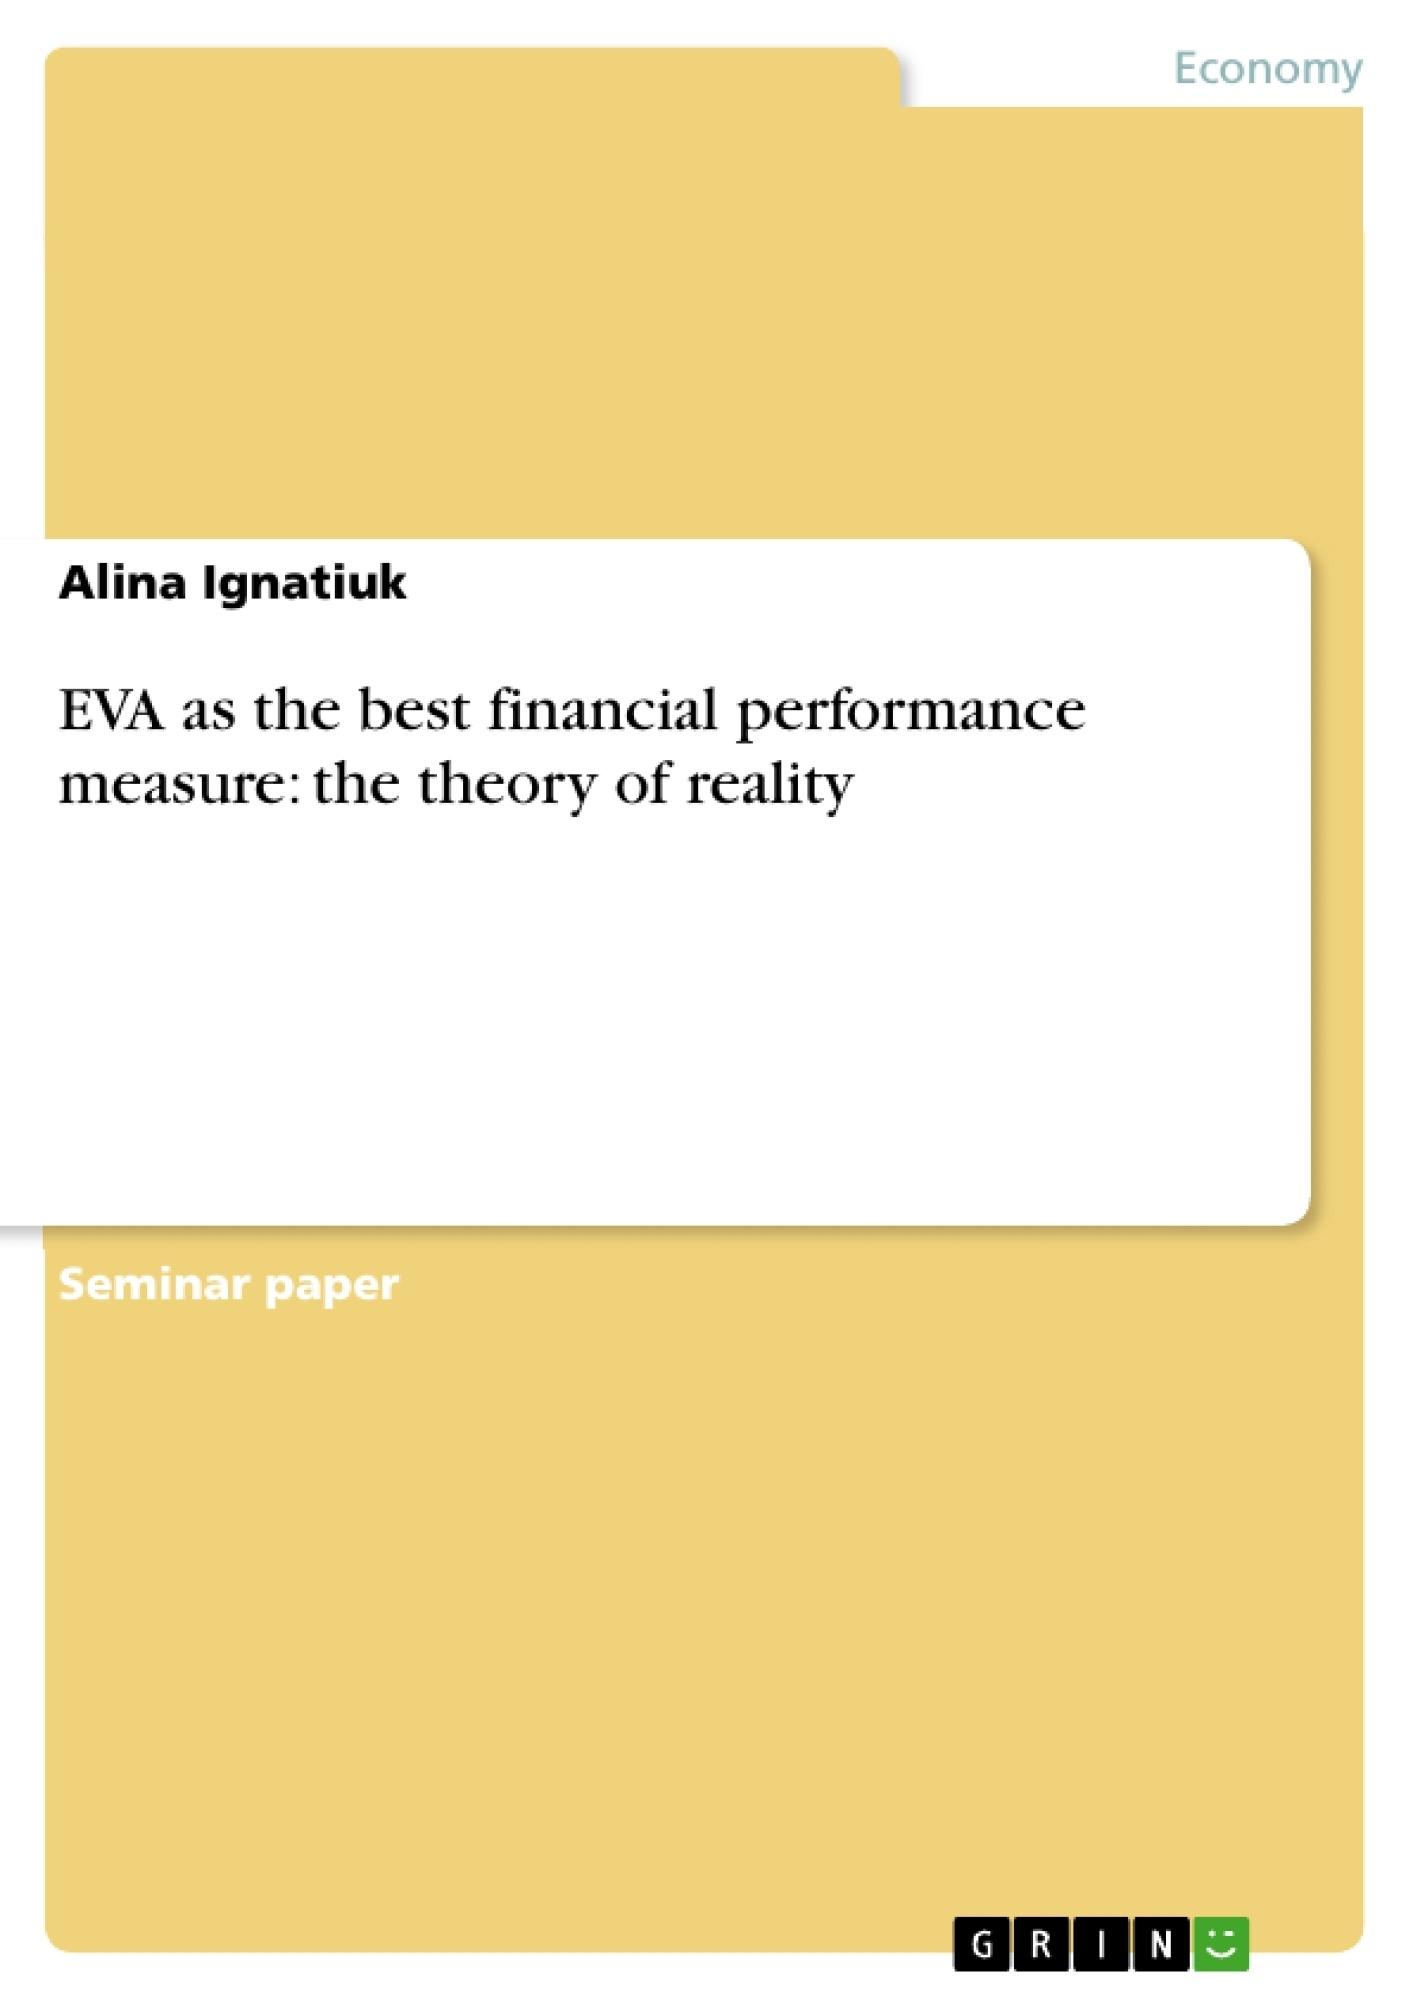 essay performance measurement